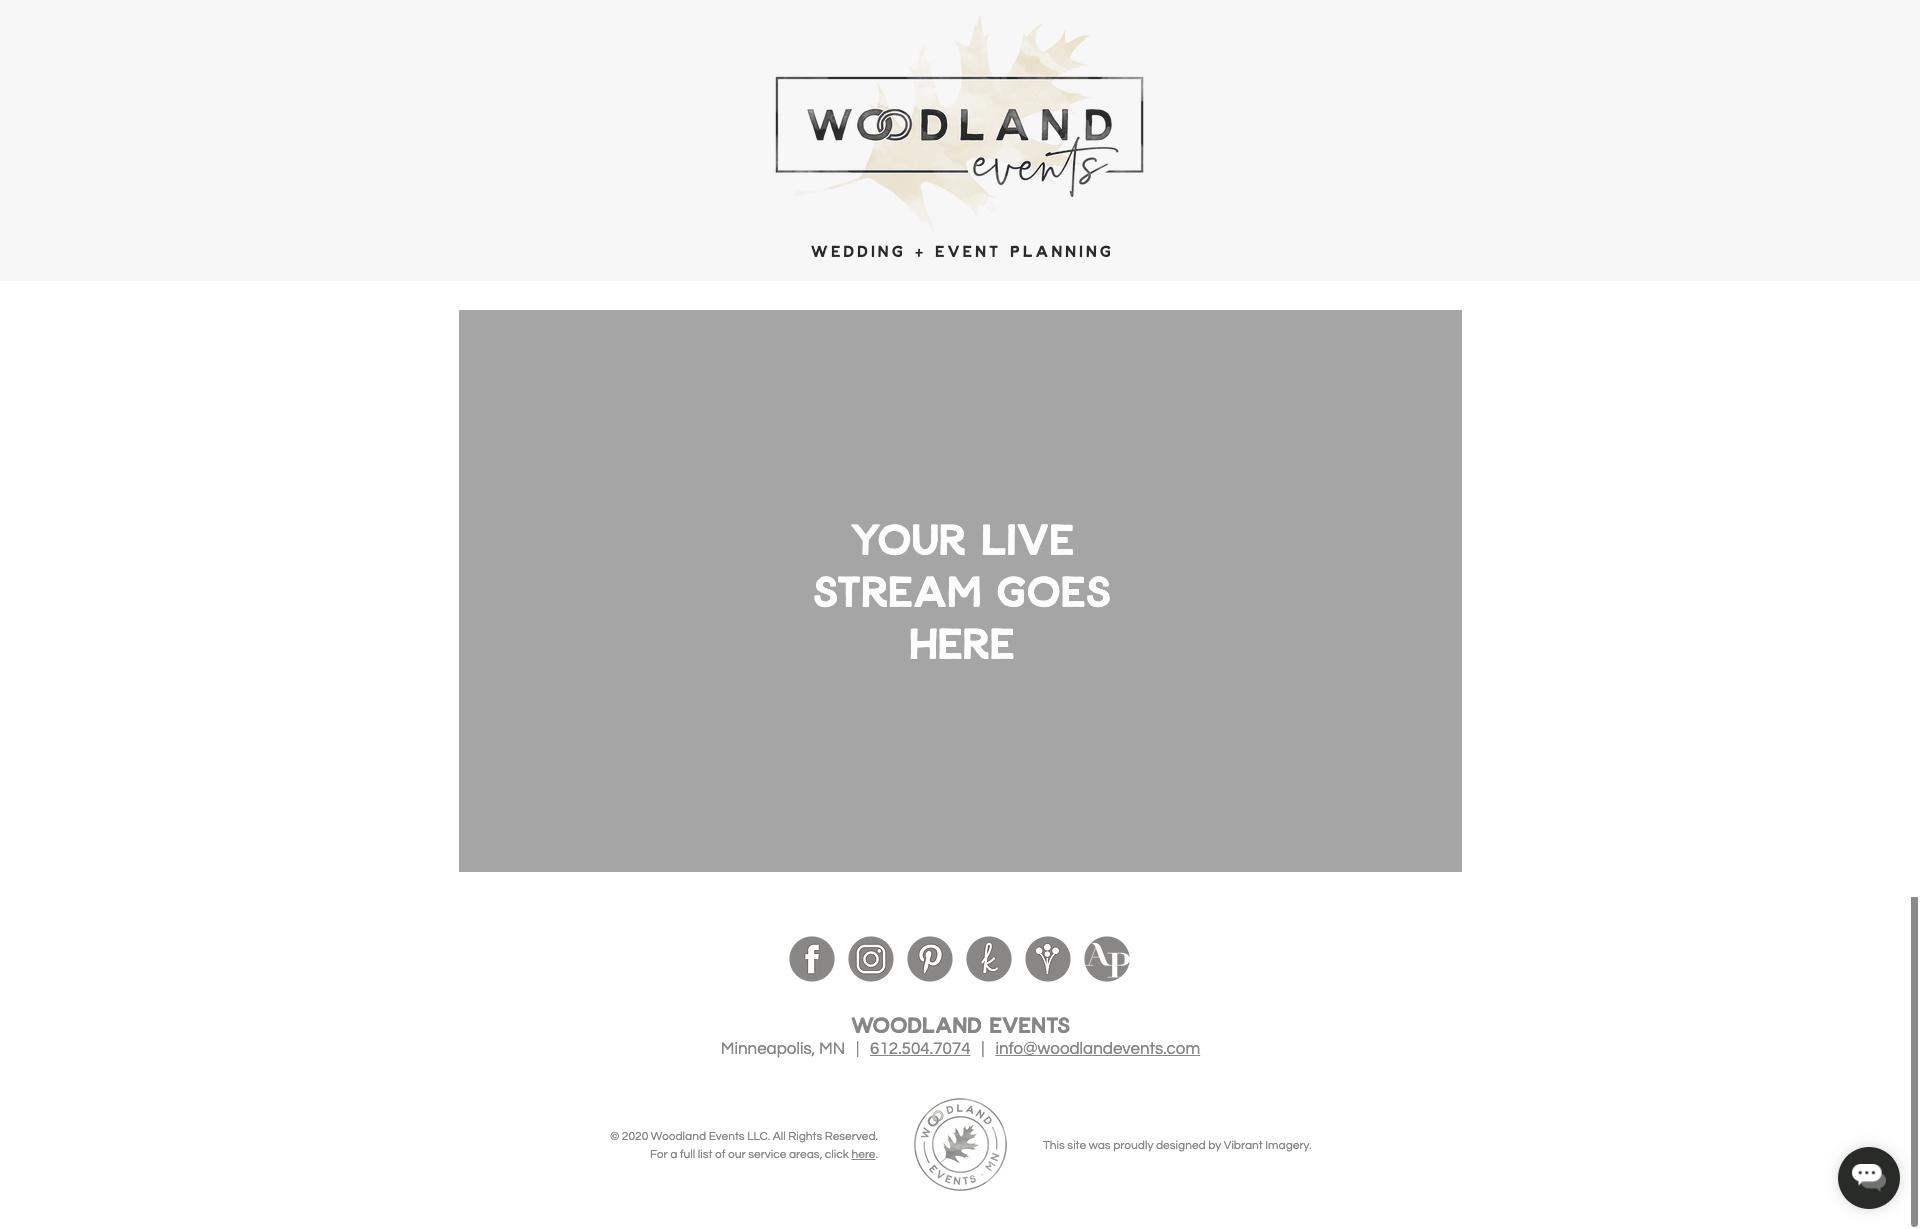 Standard Woodland Events Livestream website template.